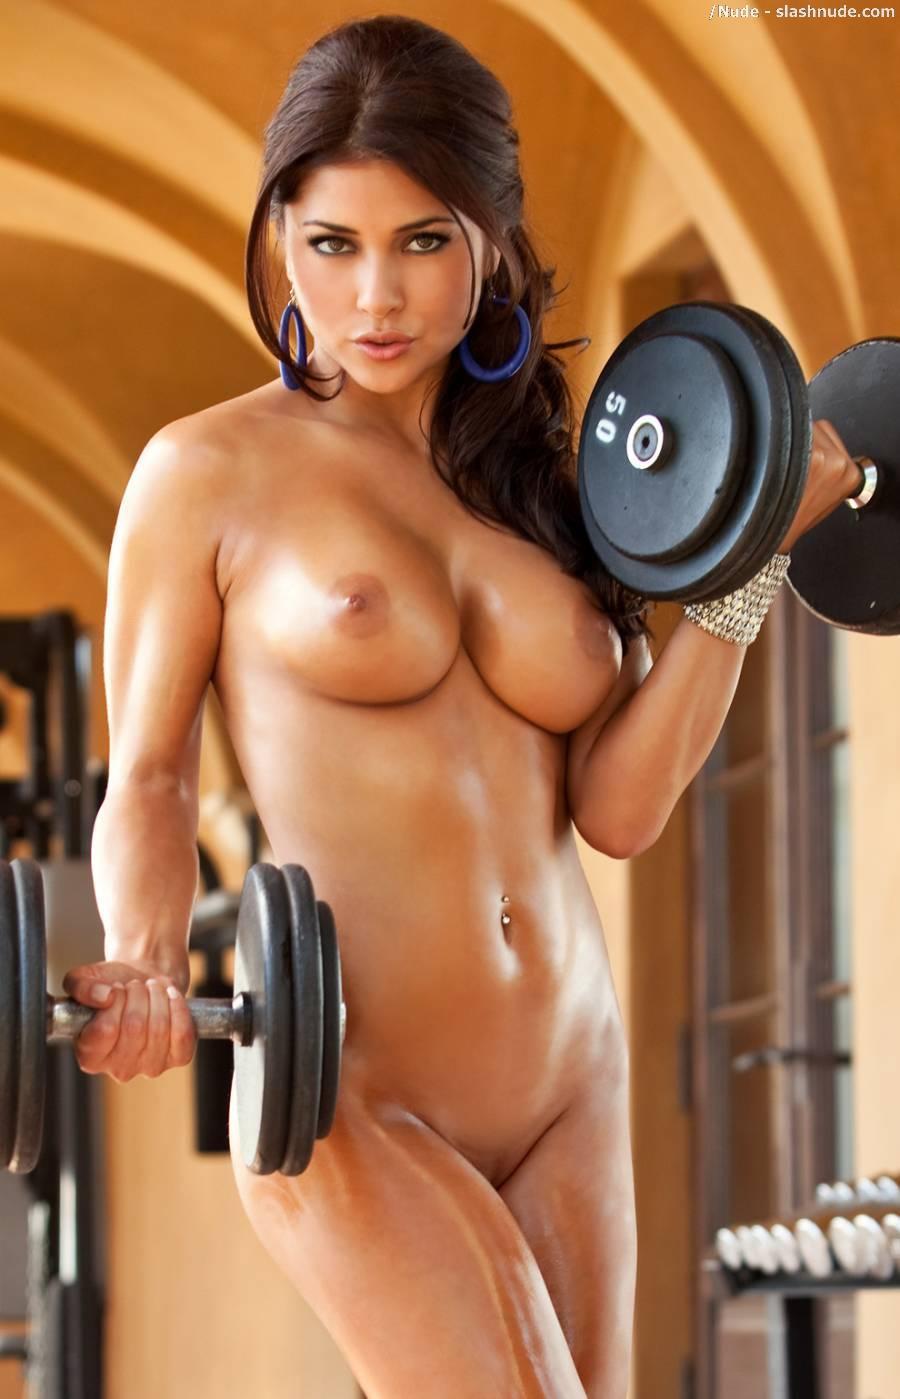 nude Naked arianny playboy celeste